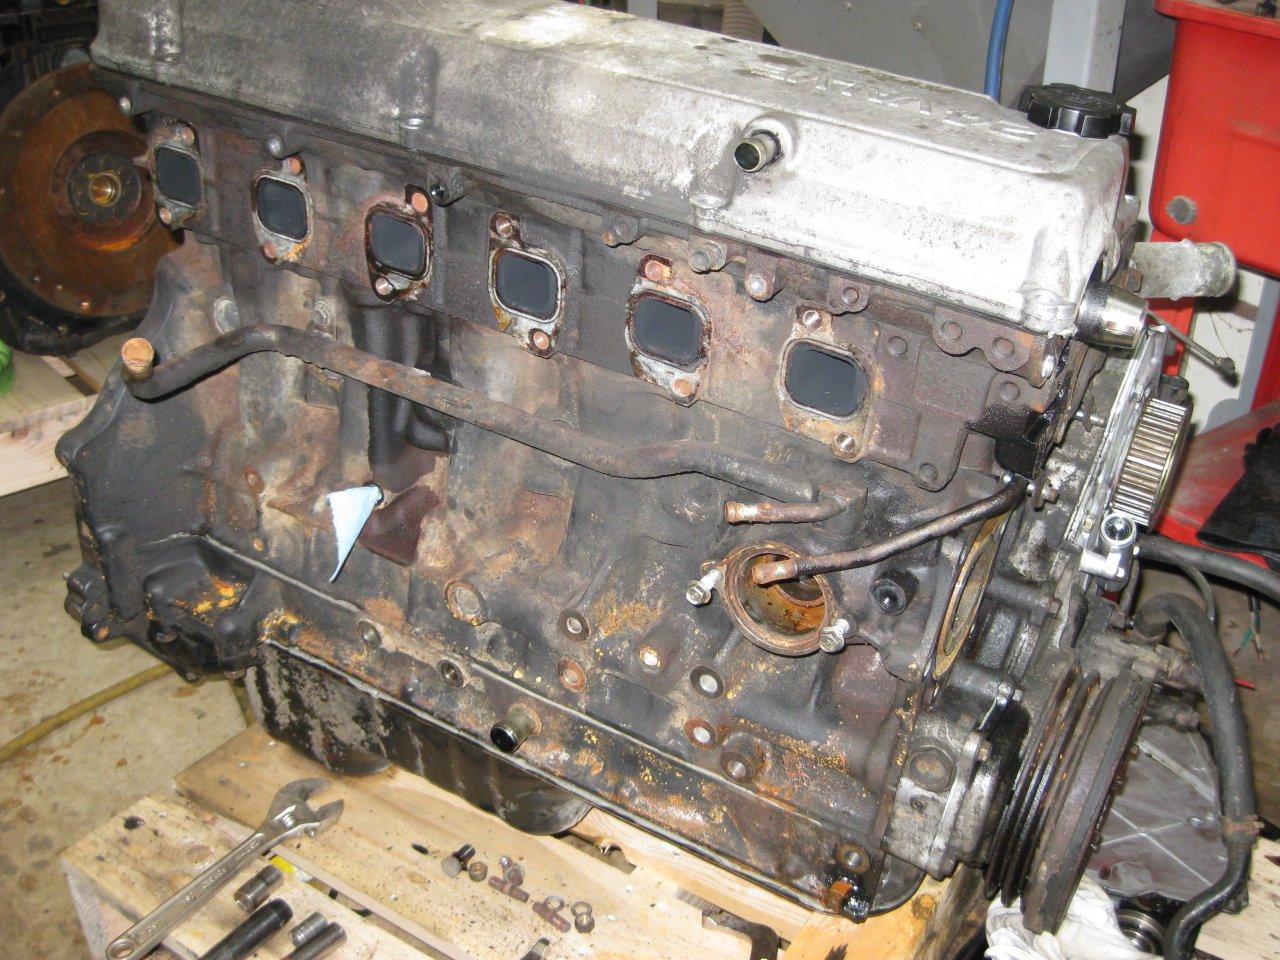 Euro 1hd Ft Turbo Diesel H151f 5 Speed Manual Lhd 96 Usa